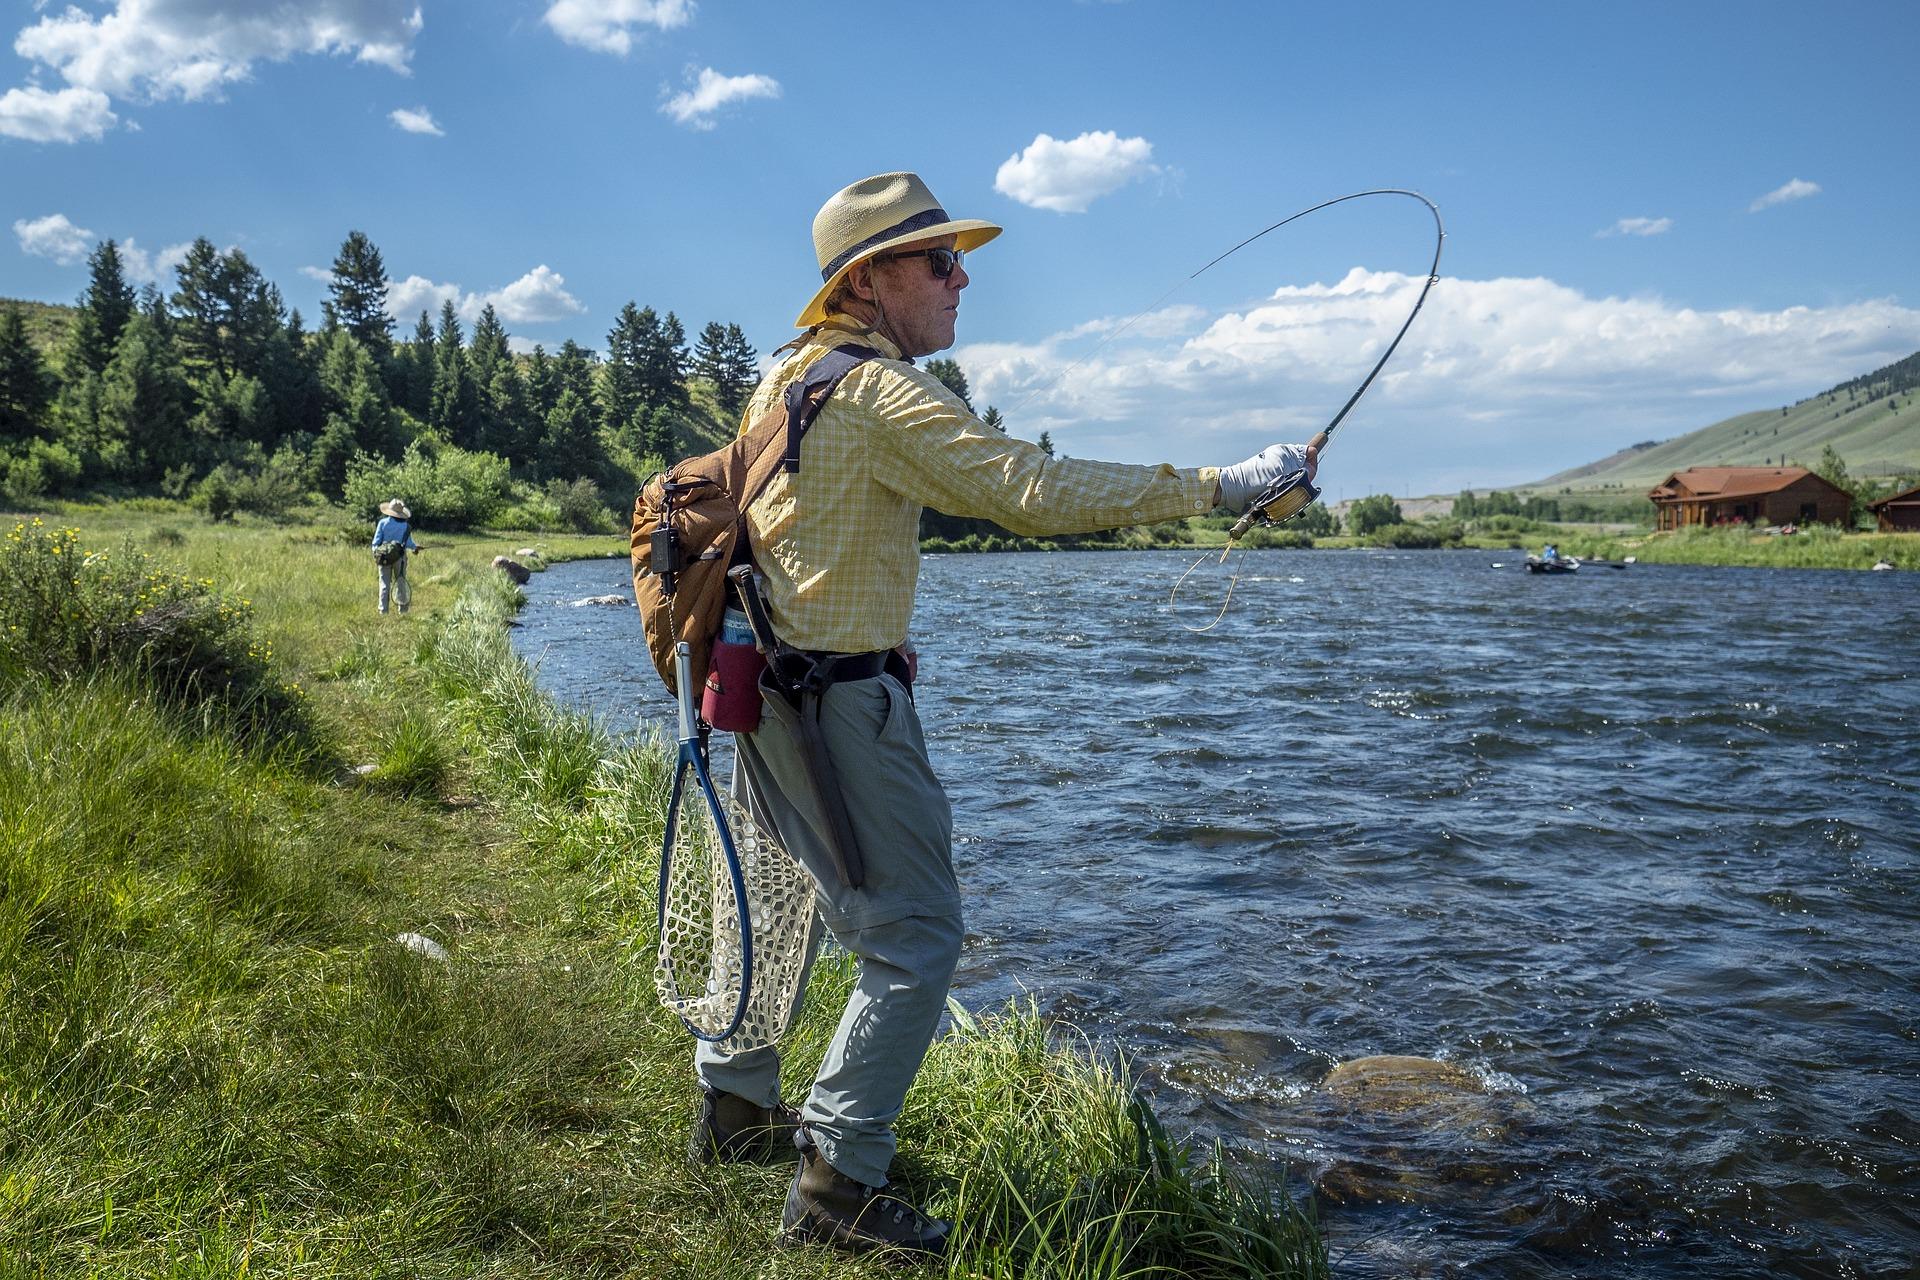 fisherman-3698511_1920.jpg